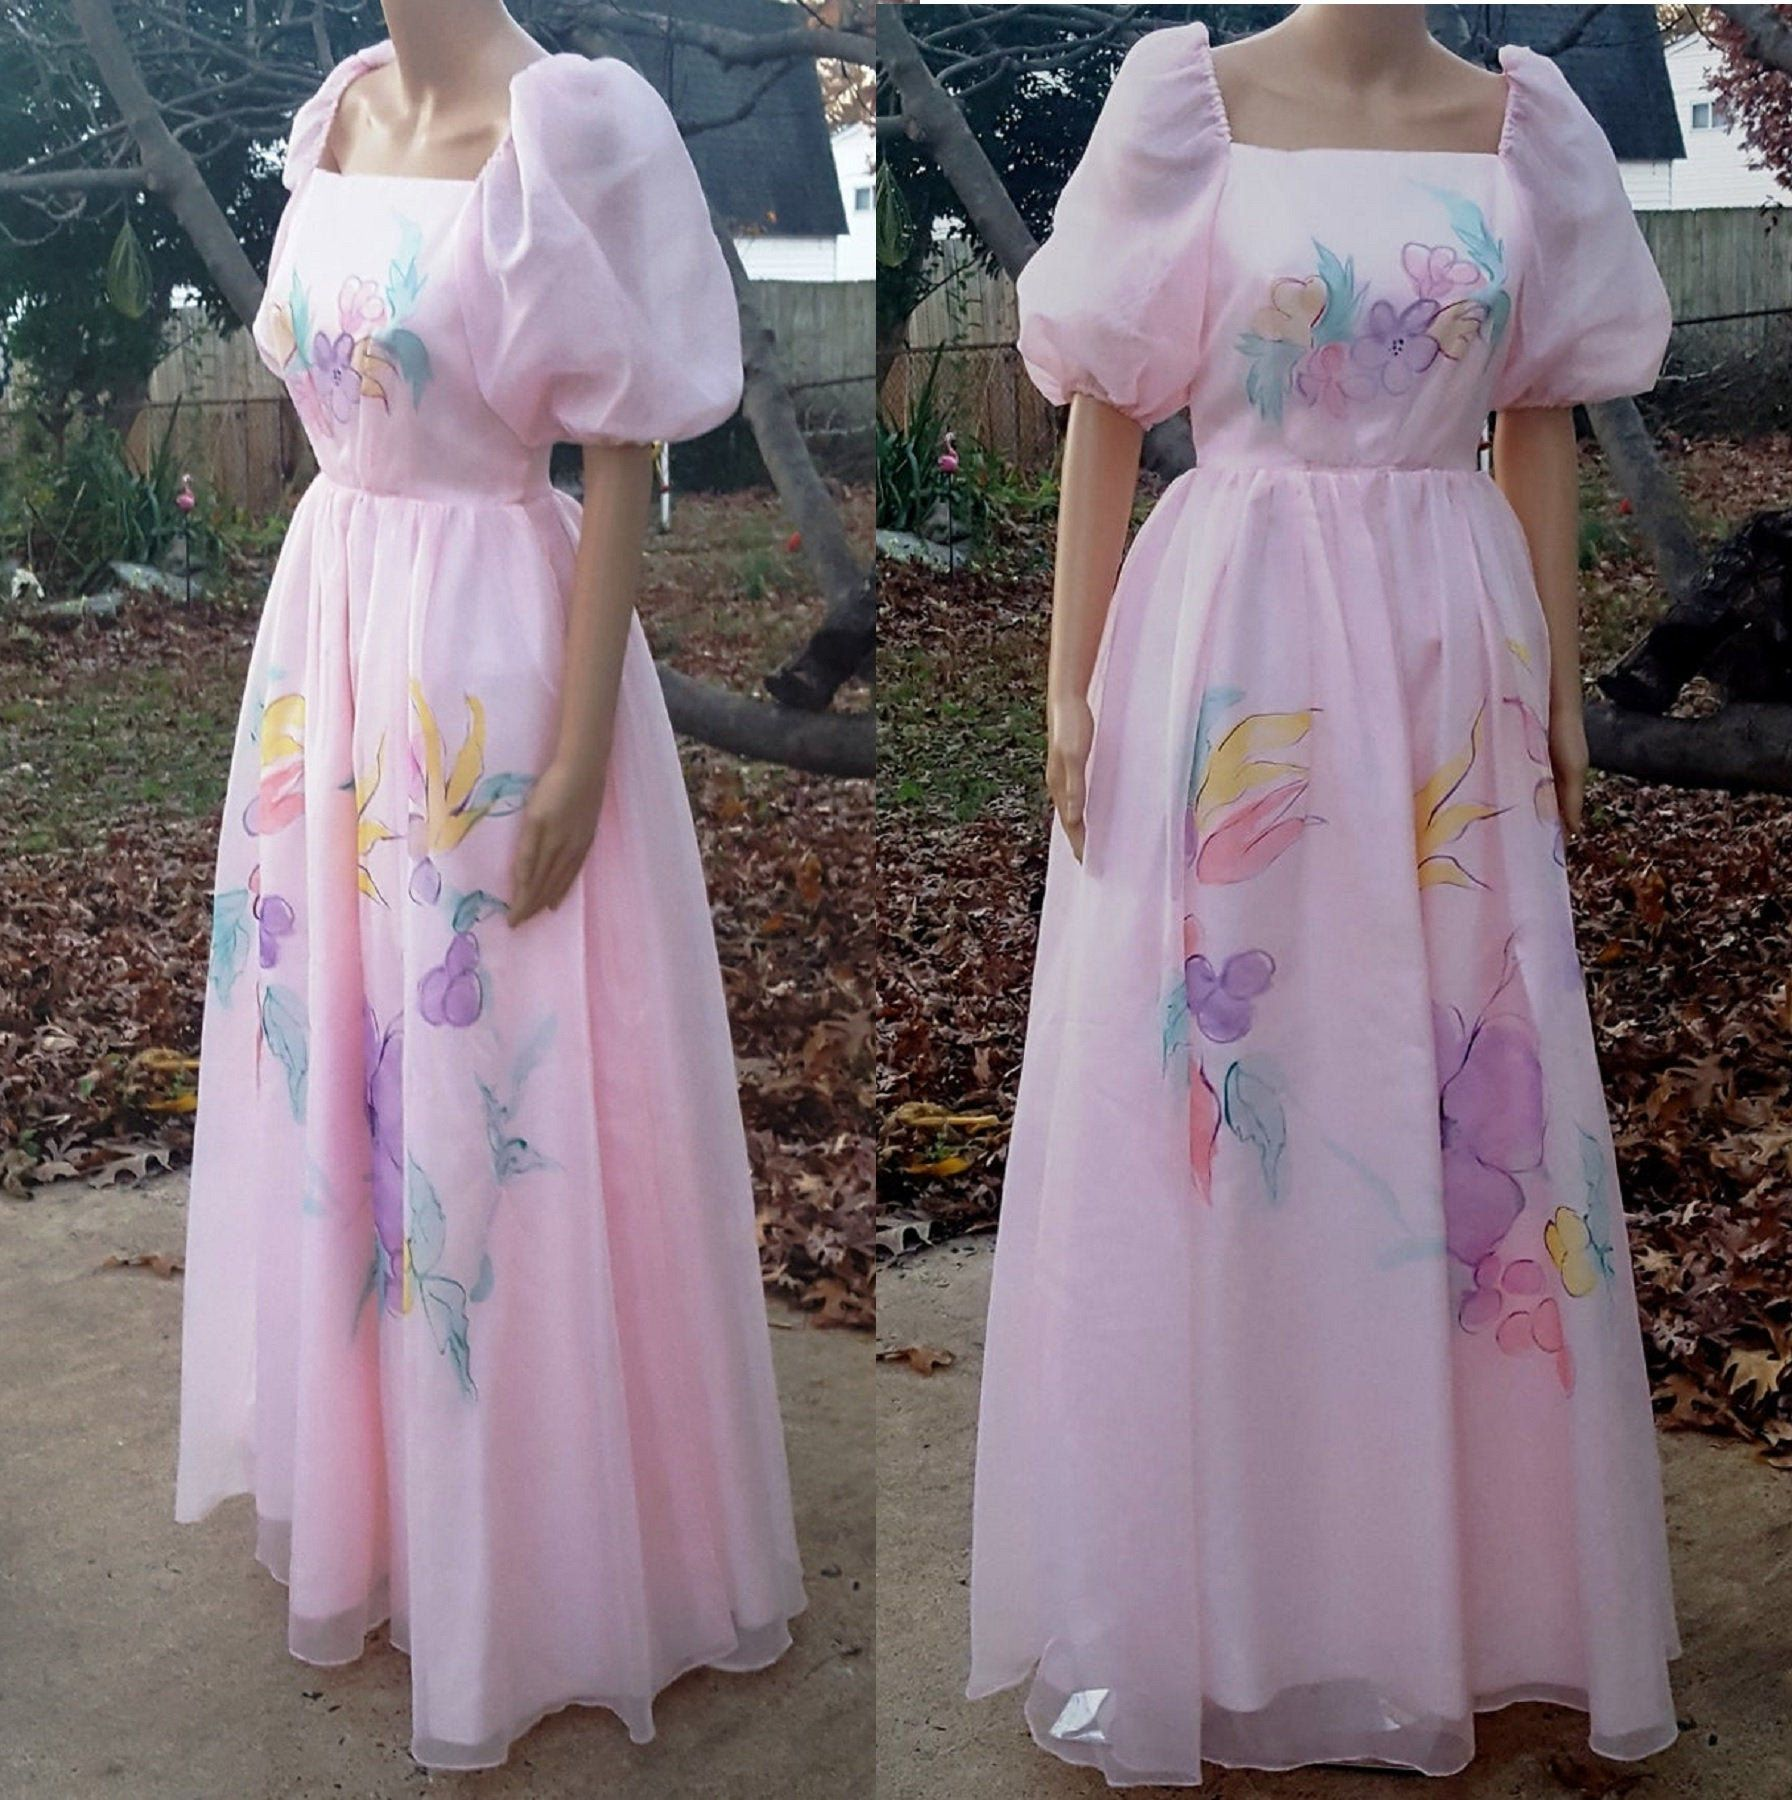 70s Prom Dress Hand Painted Dress Floral Dress Vintage Etsy Vintage Dresses 70s Prom Dress Dresses [ 1800 x 1792 Pixel ]